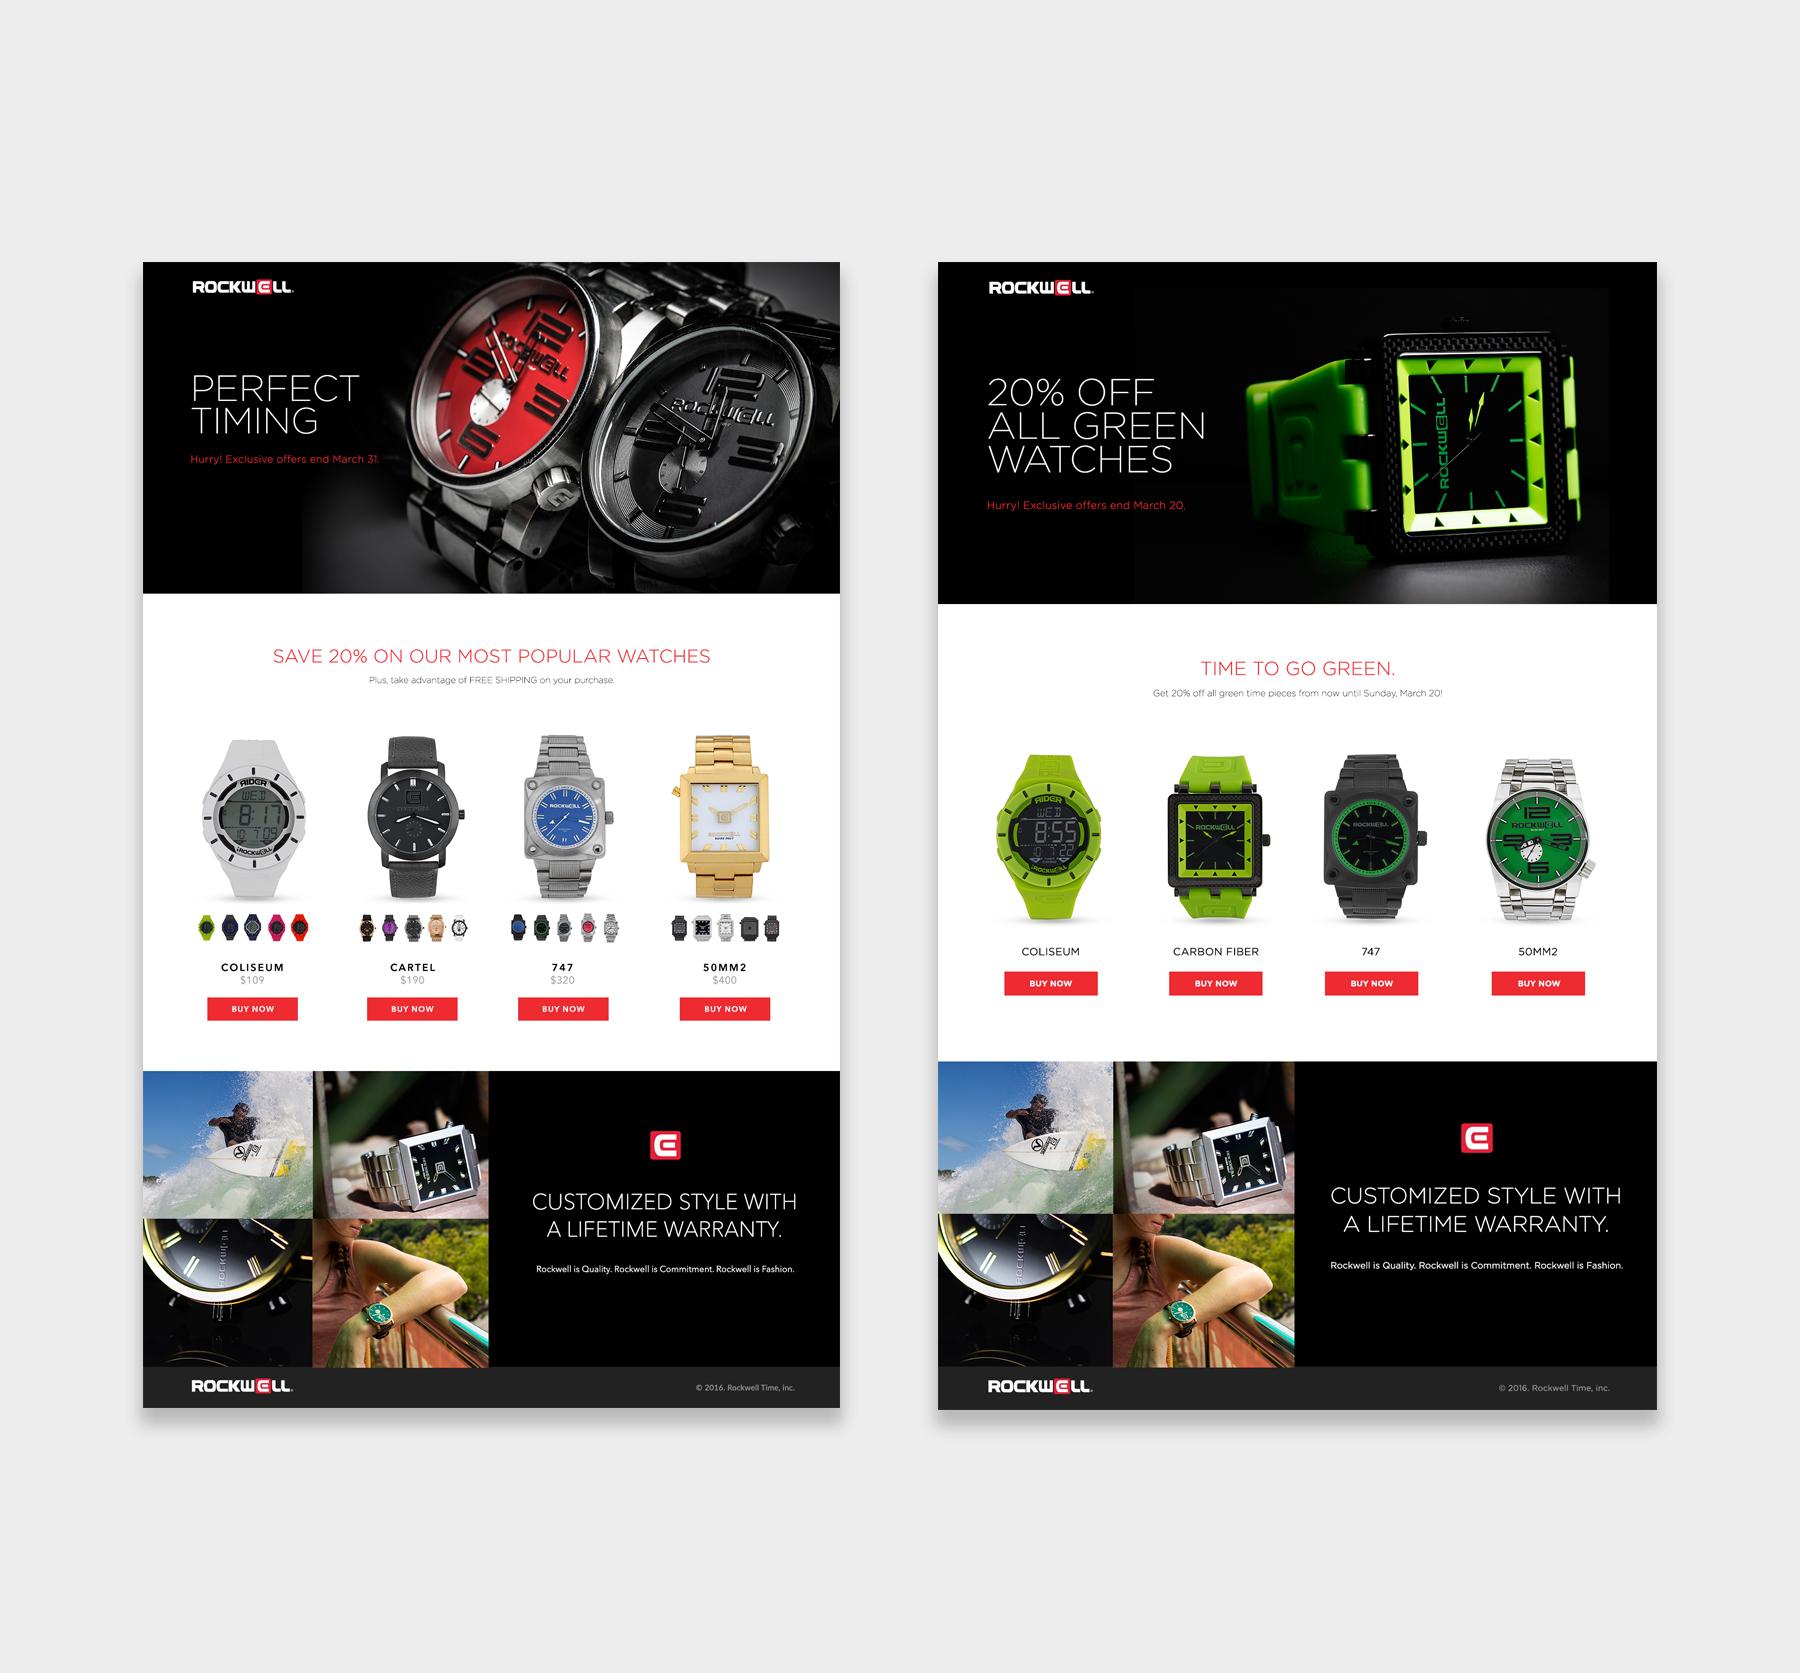 Rockwell Time website screenshots